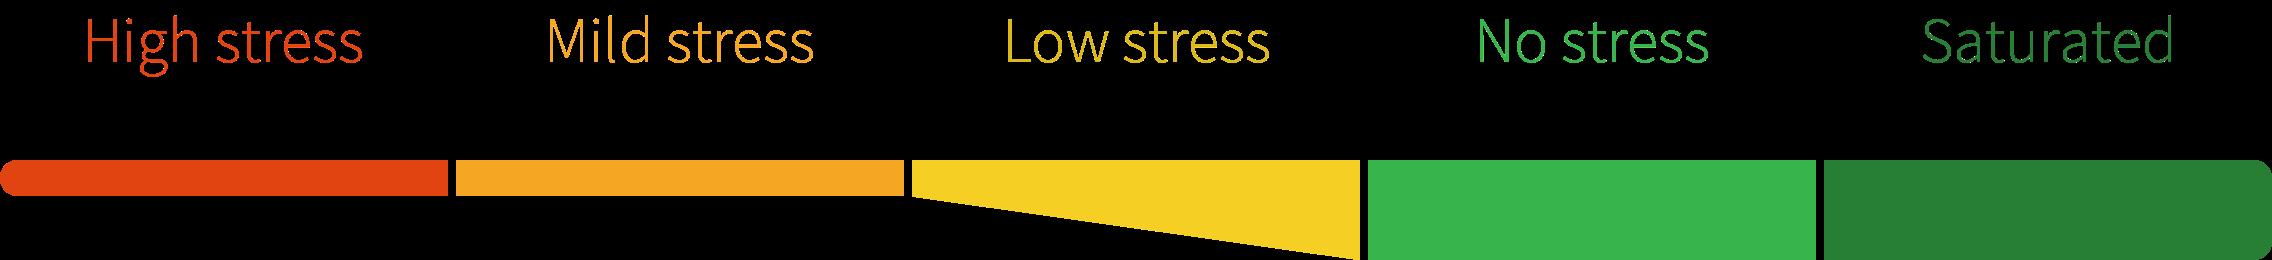 Phtech stress levels